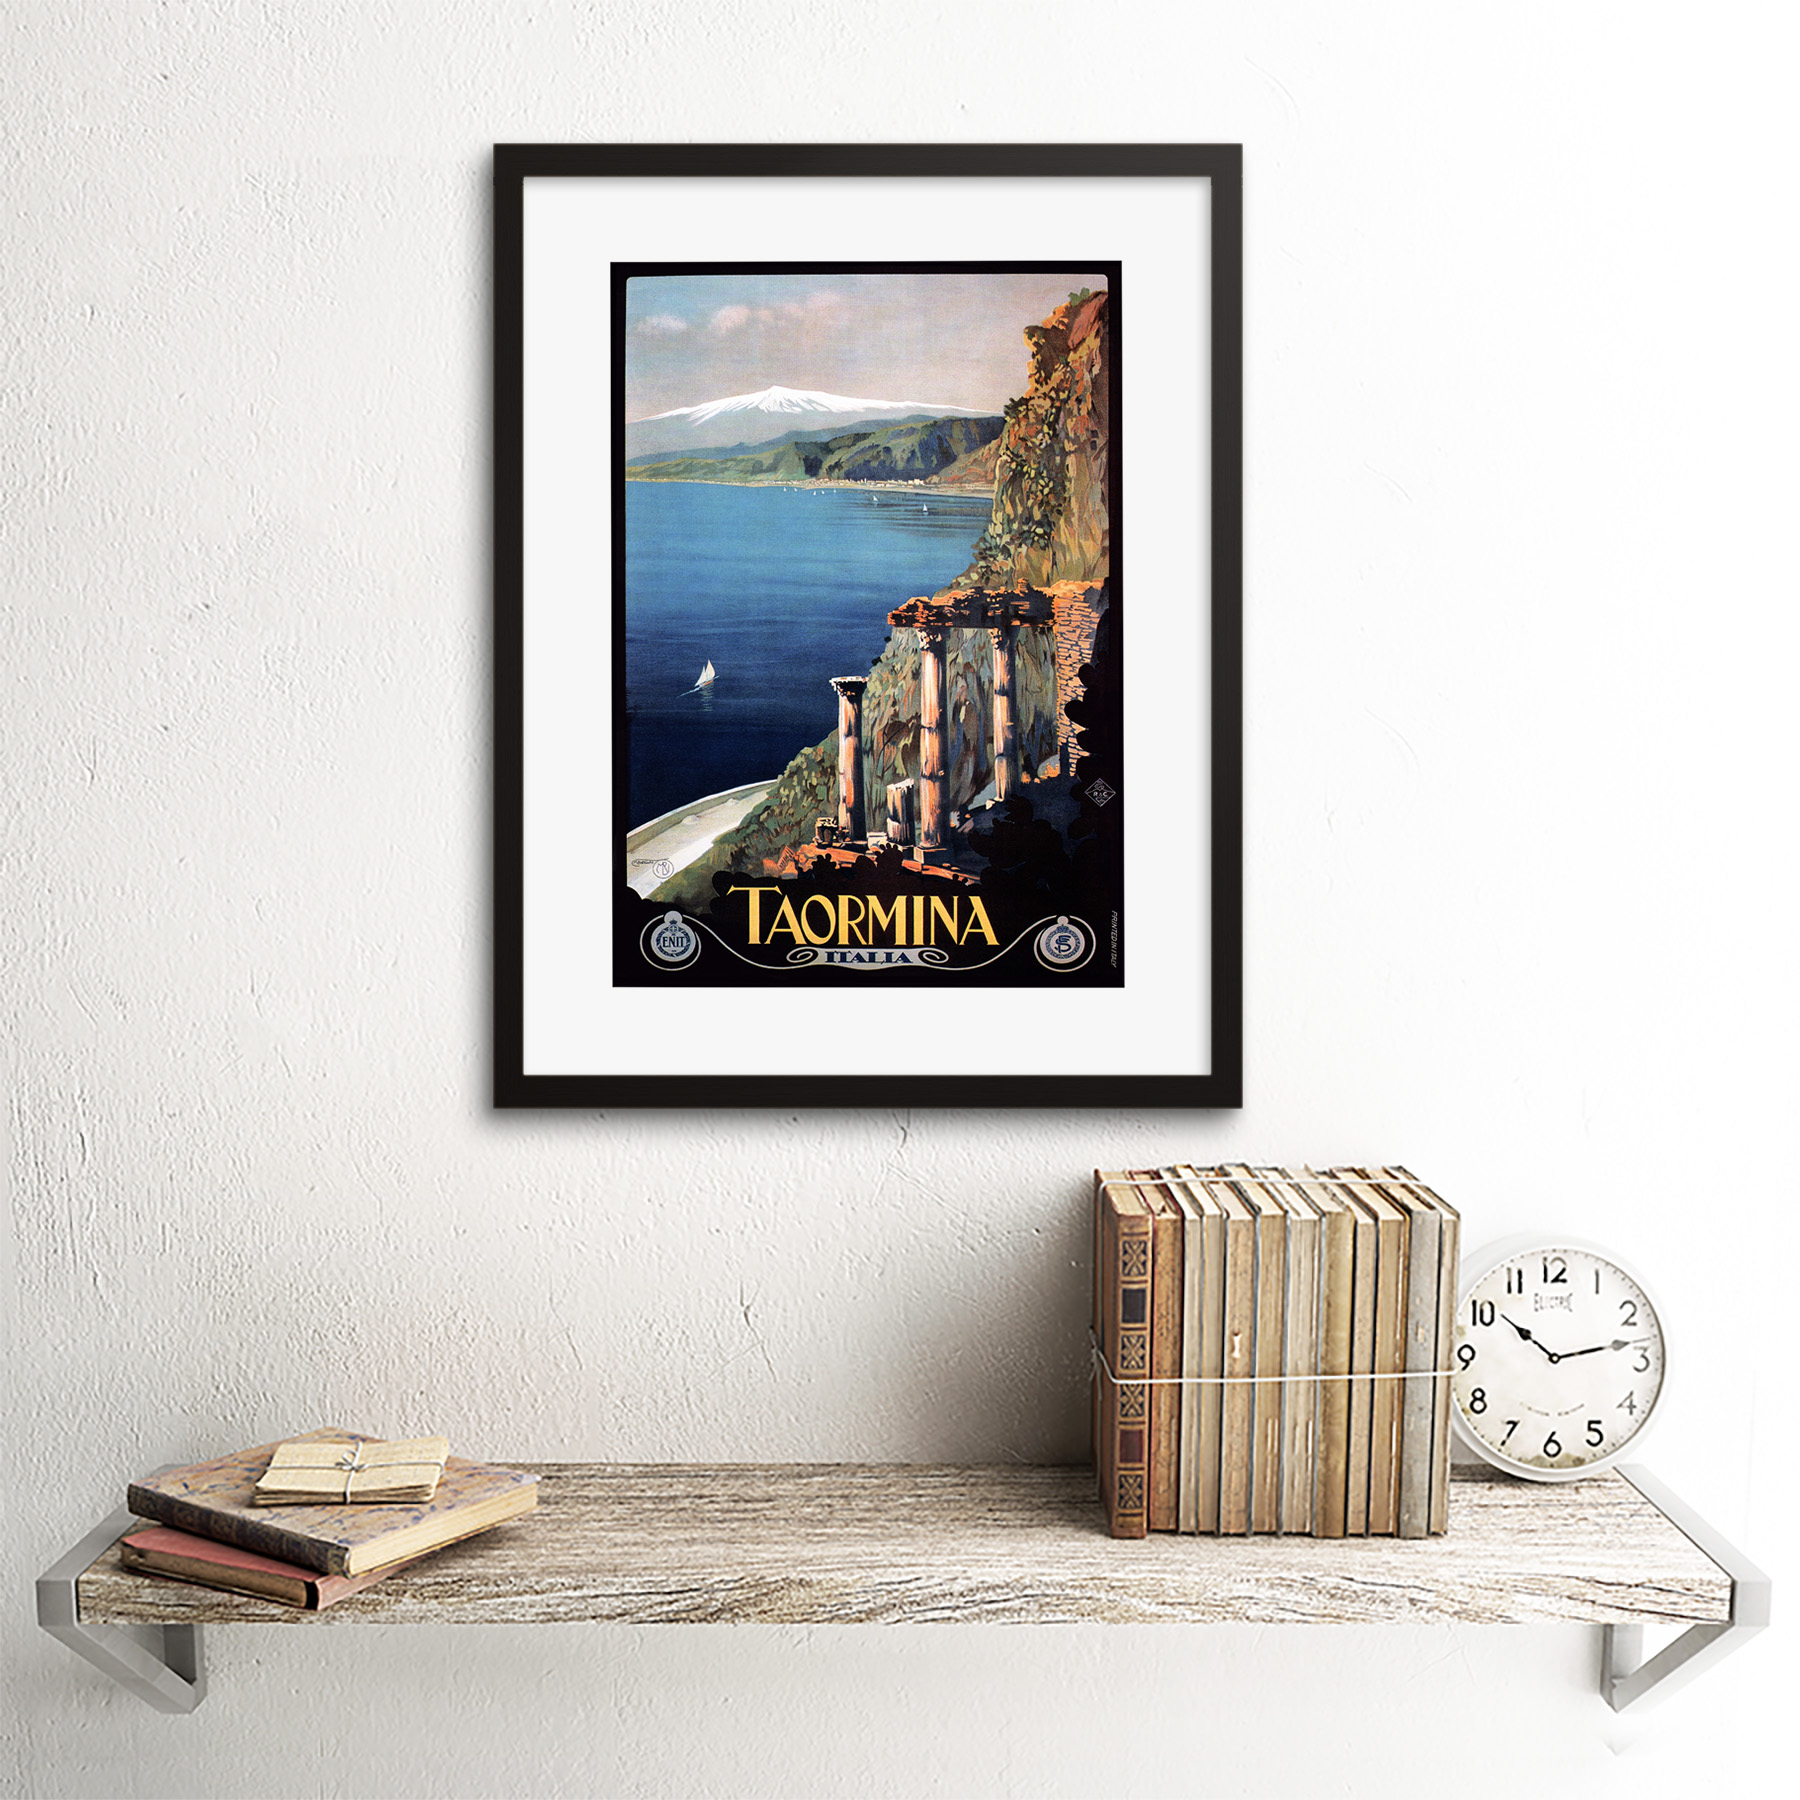 thumbnail 3 - Travel Taormina Sicily Etna Greek Theatre Italy Framed Art Print 12x16 Inch